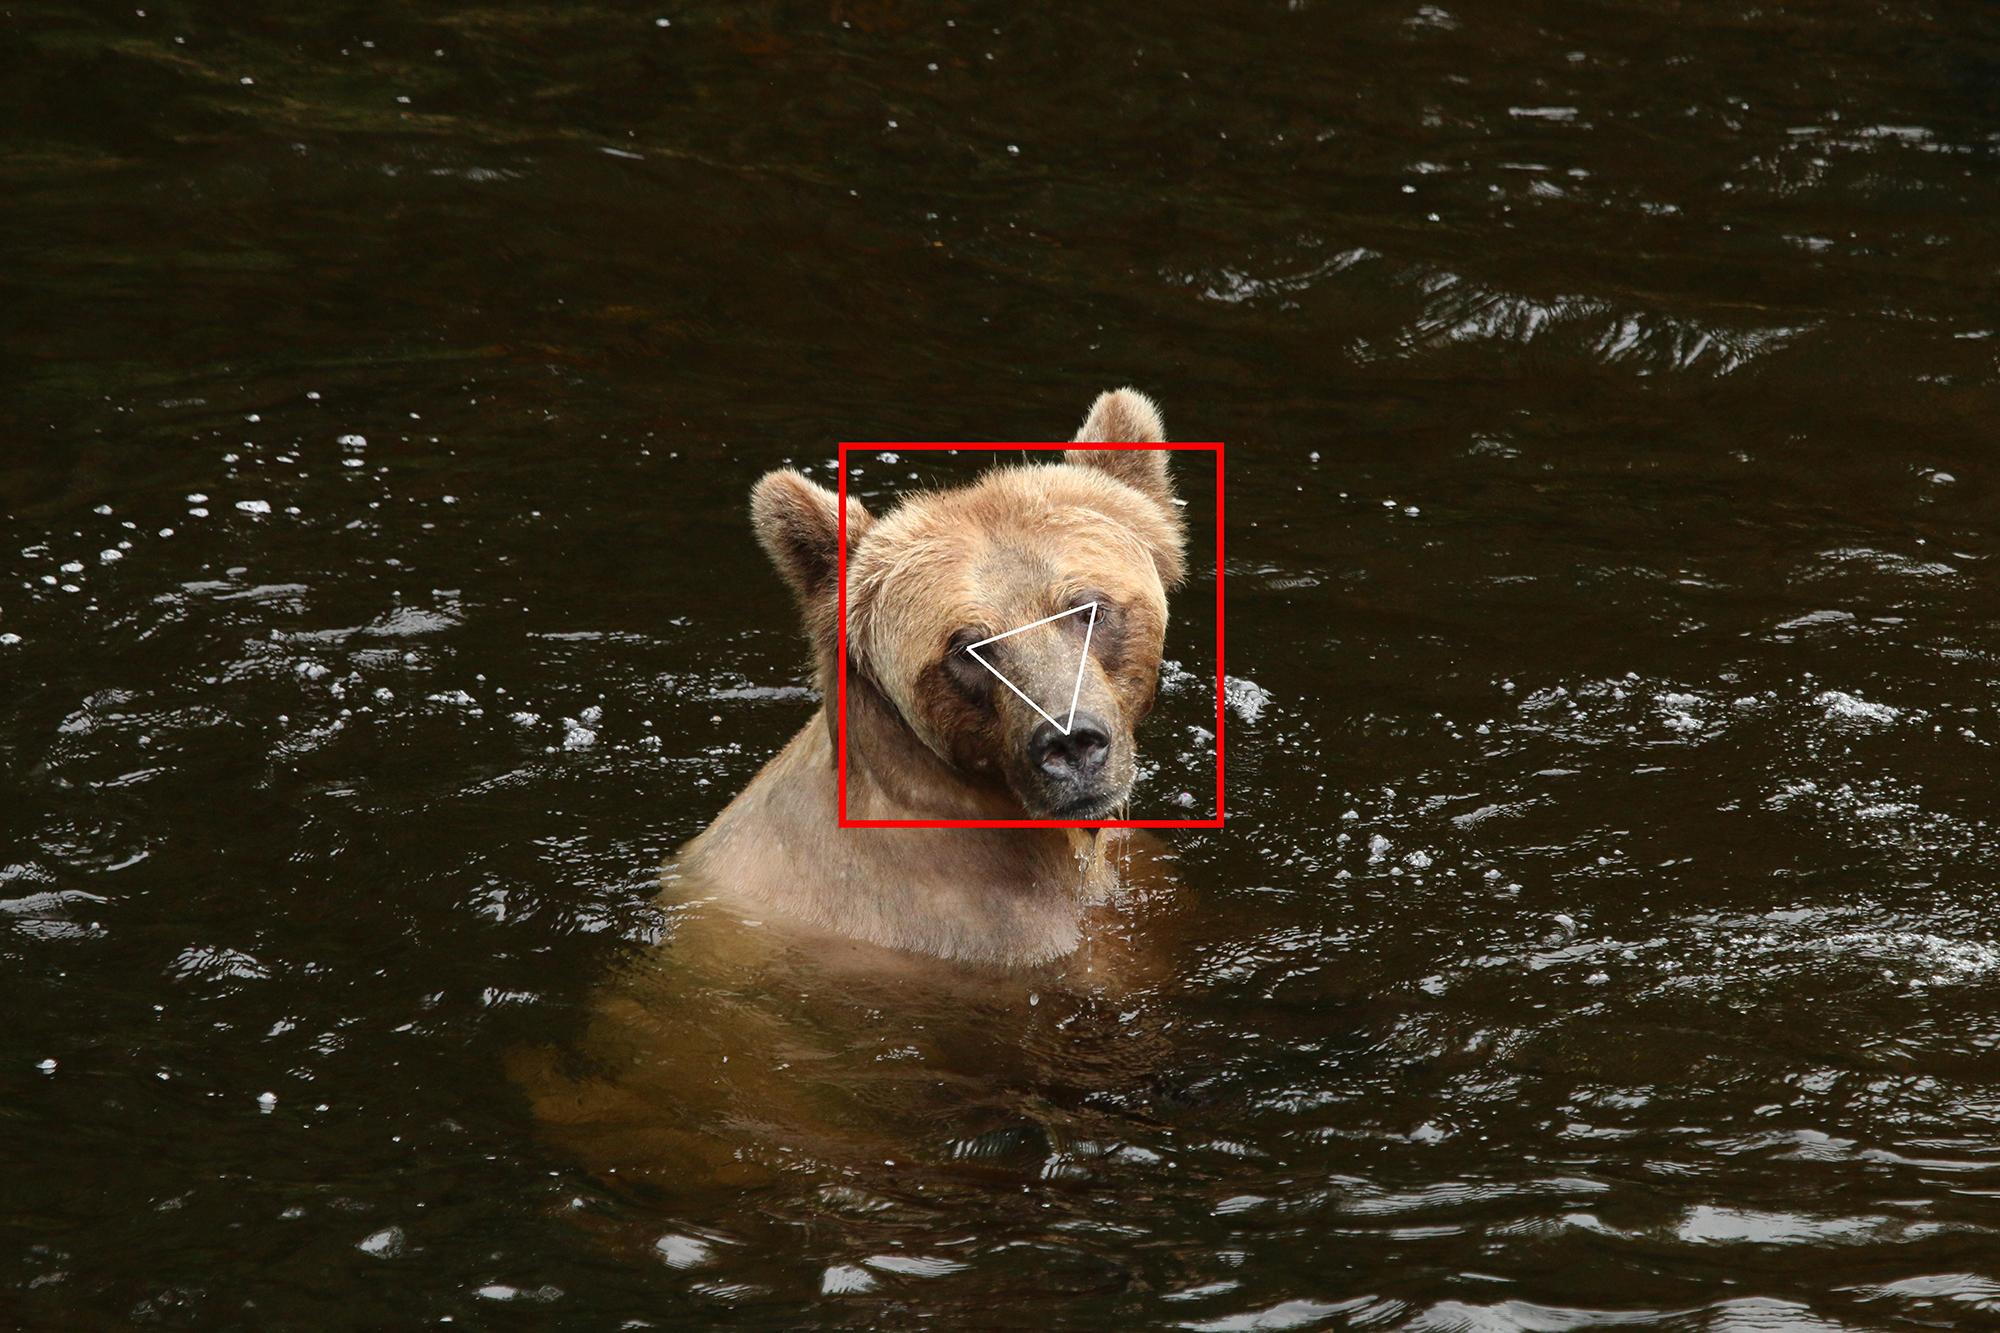 BearID identifica ursos em imagens